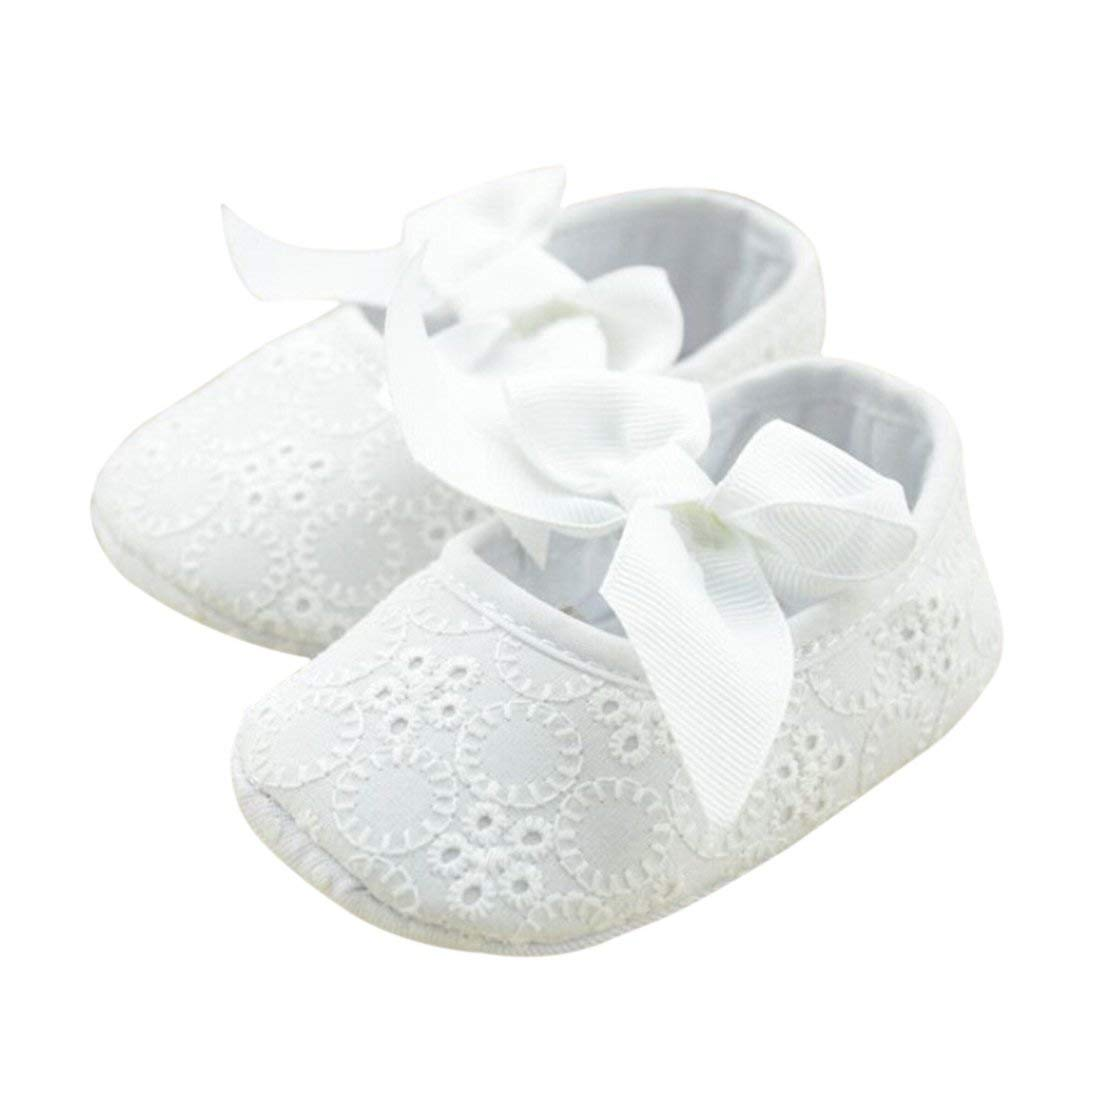 c27f4708fb4d Get Quotations · Bluelans® Infant Girls Cotton Ribbon Bowknot Soft Bottom  Flower Prewalker Baby Shoes - 0-